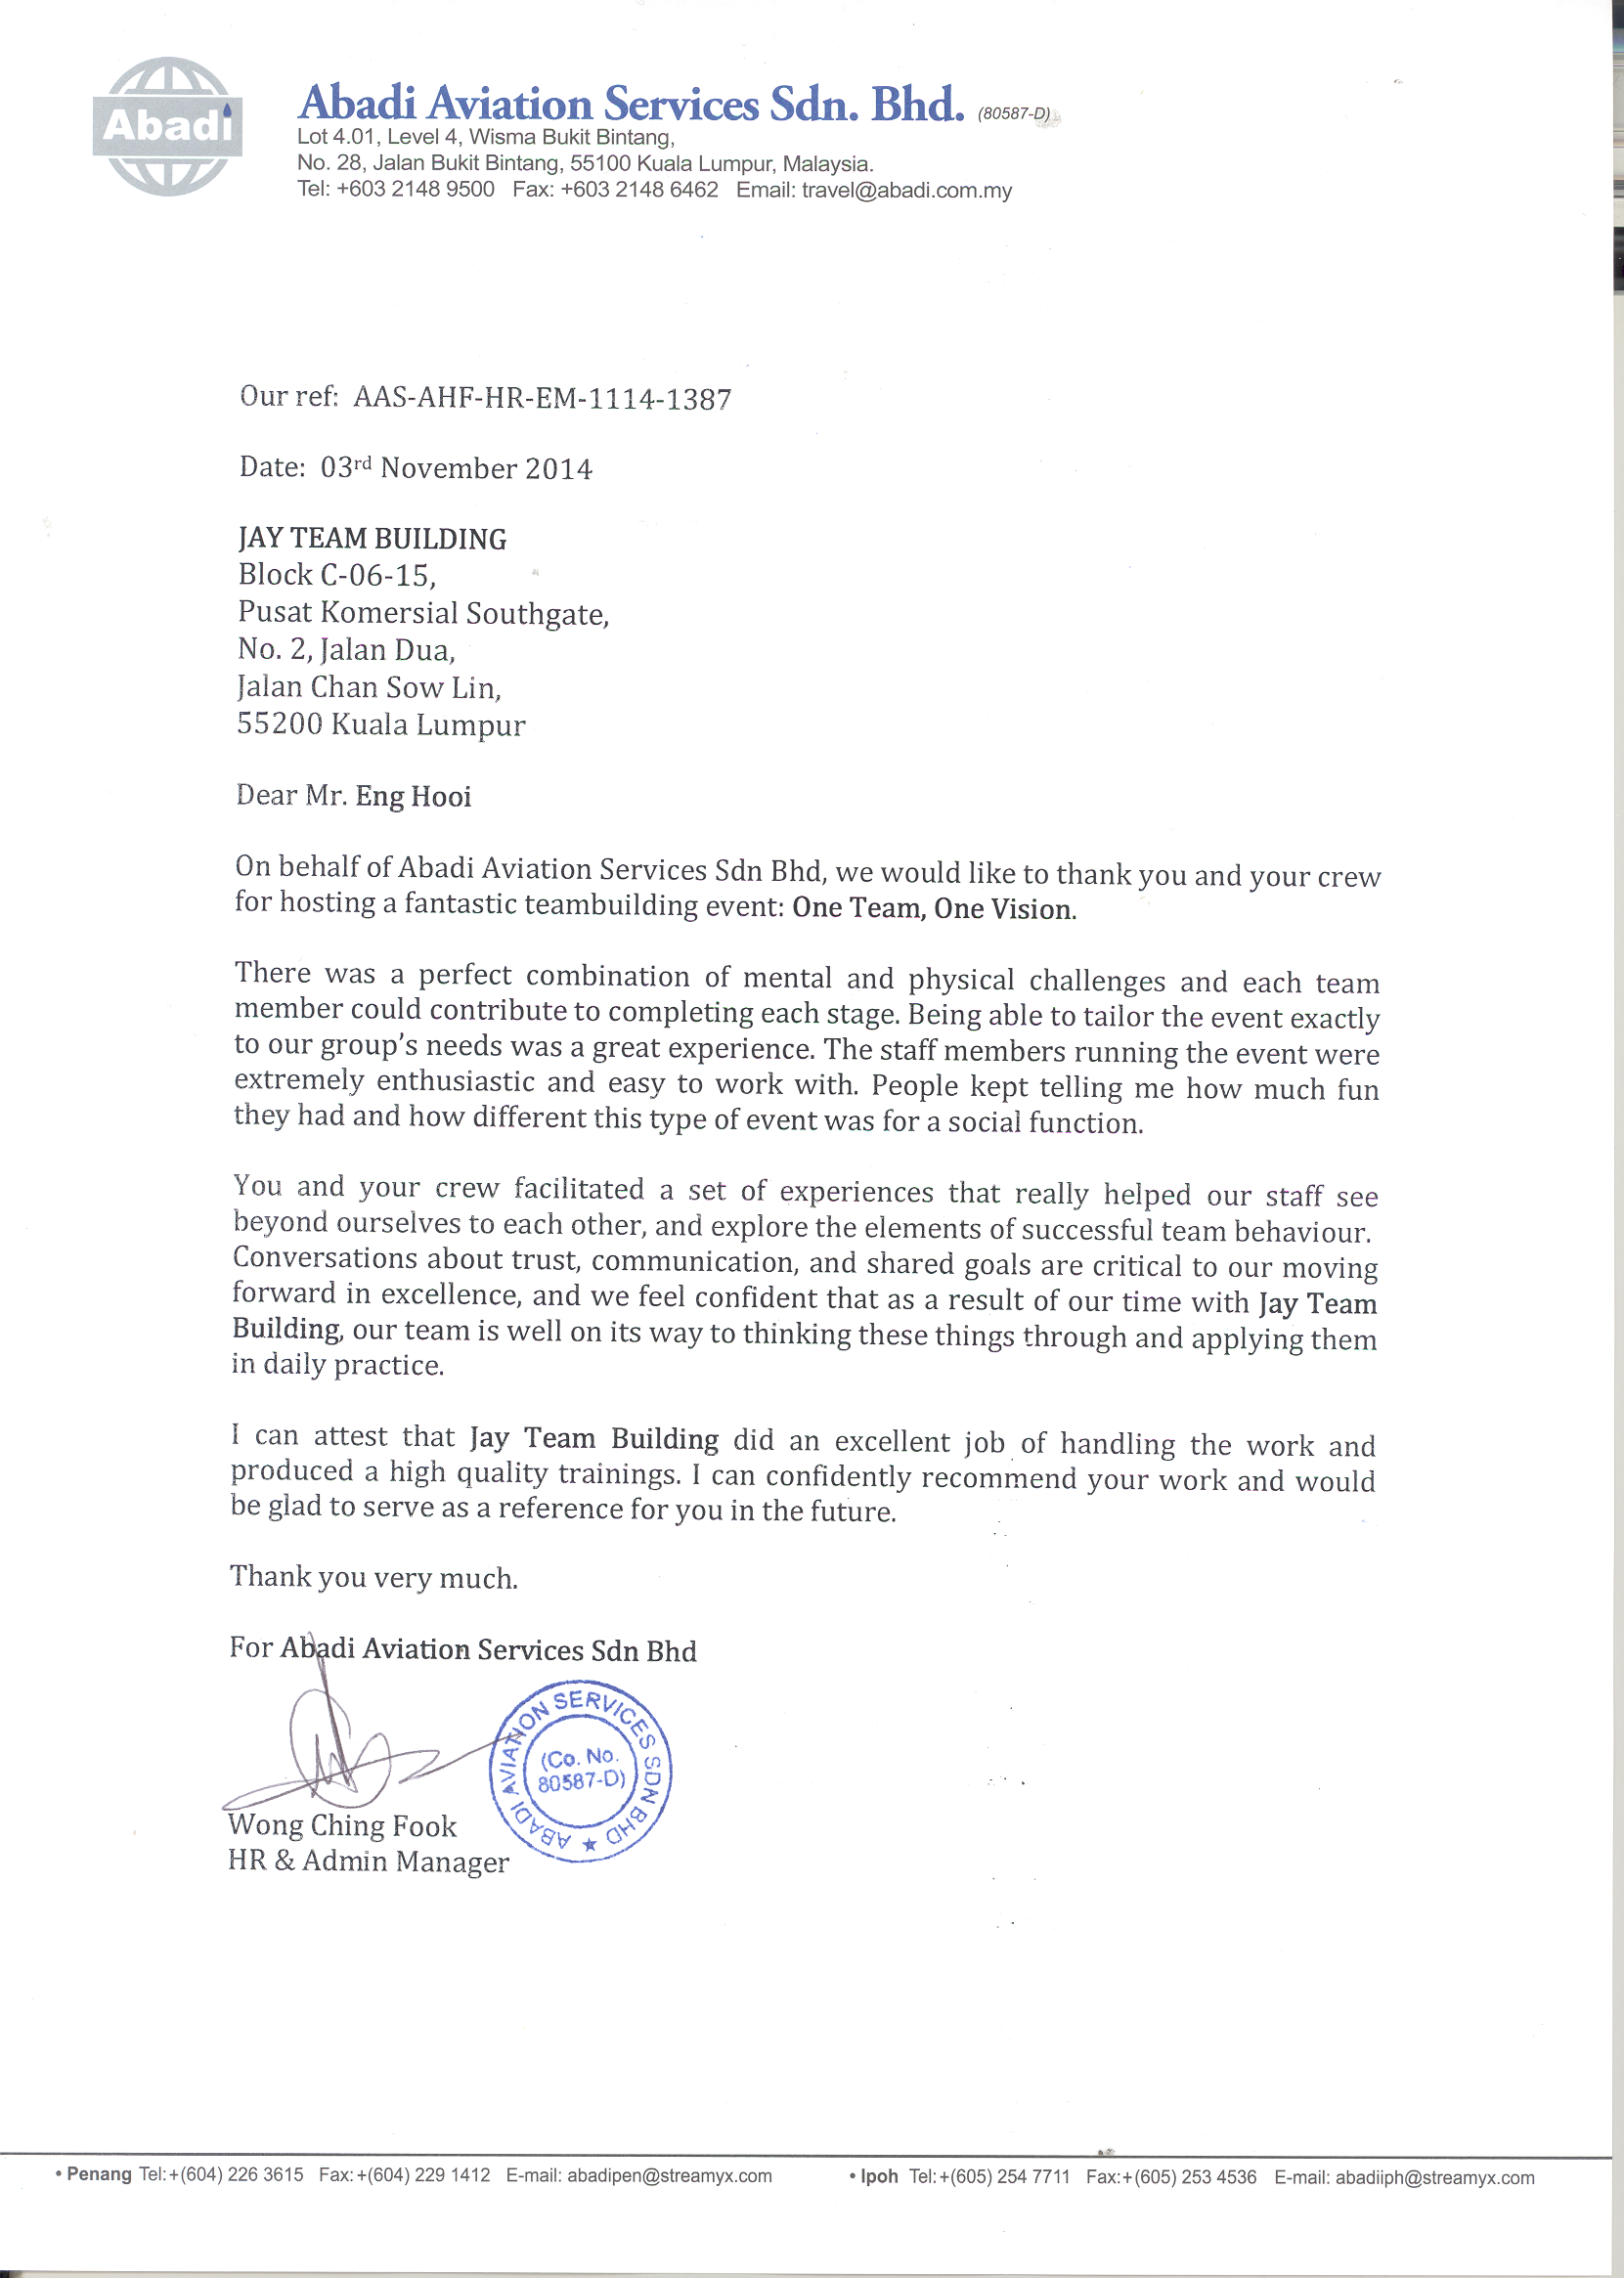 Testimonial Appreciation - Abadi Aviation Services